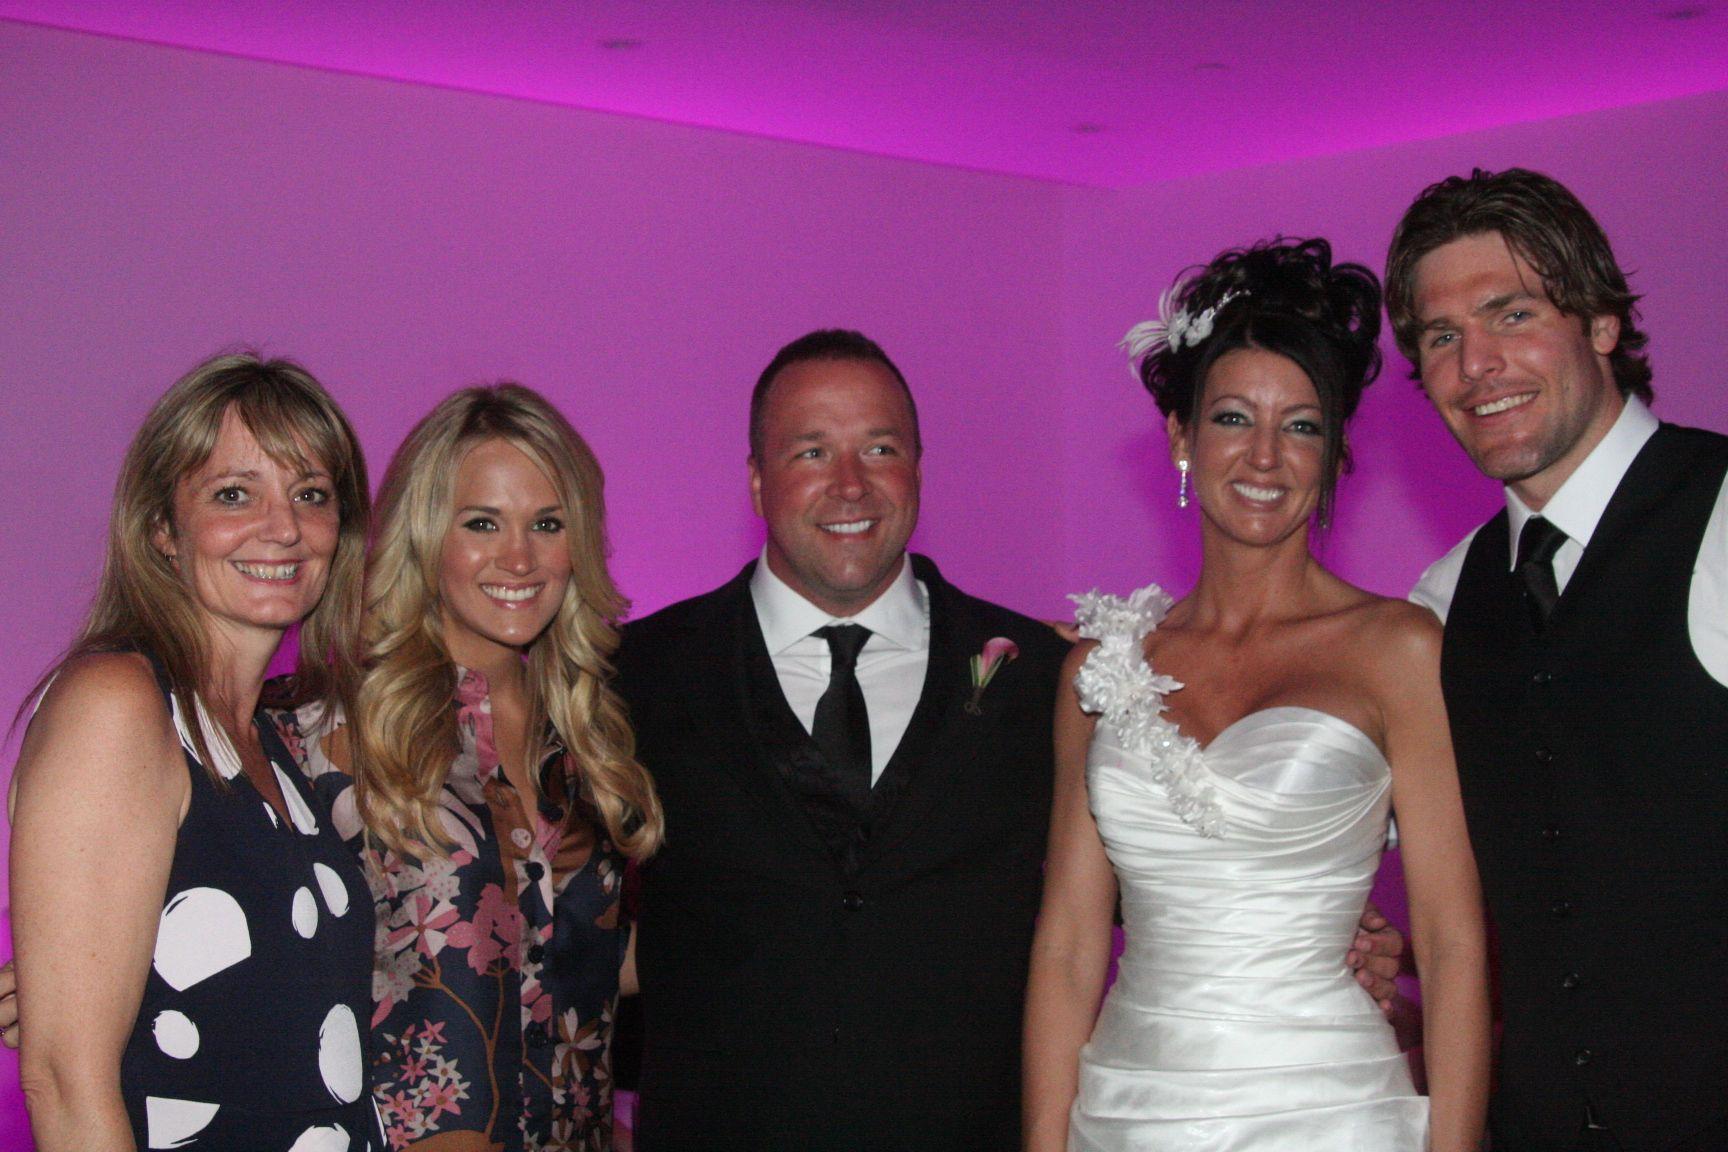 Carrie+Underwood+Wedding | Carrie Underwood at wedding An English Rose Wedding Planner 9